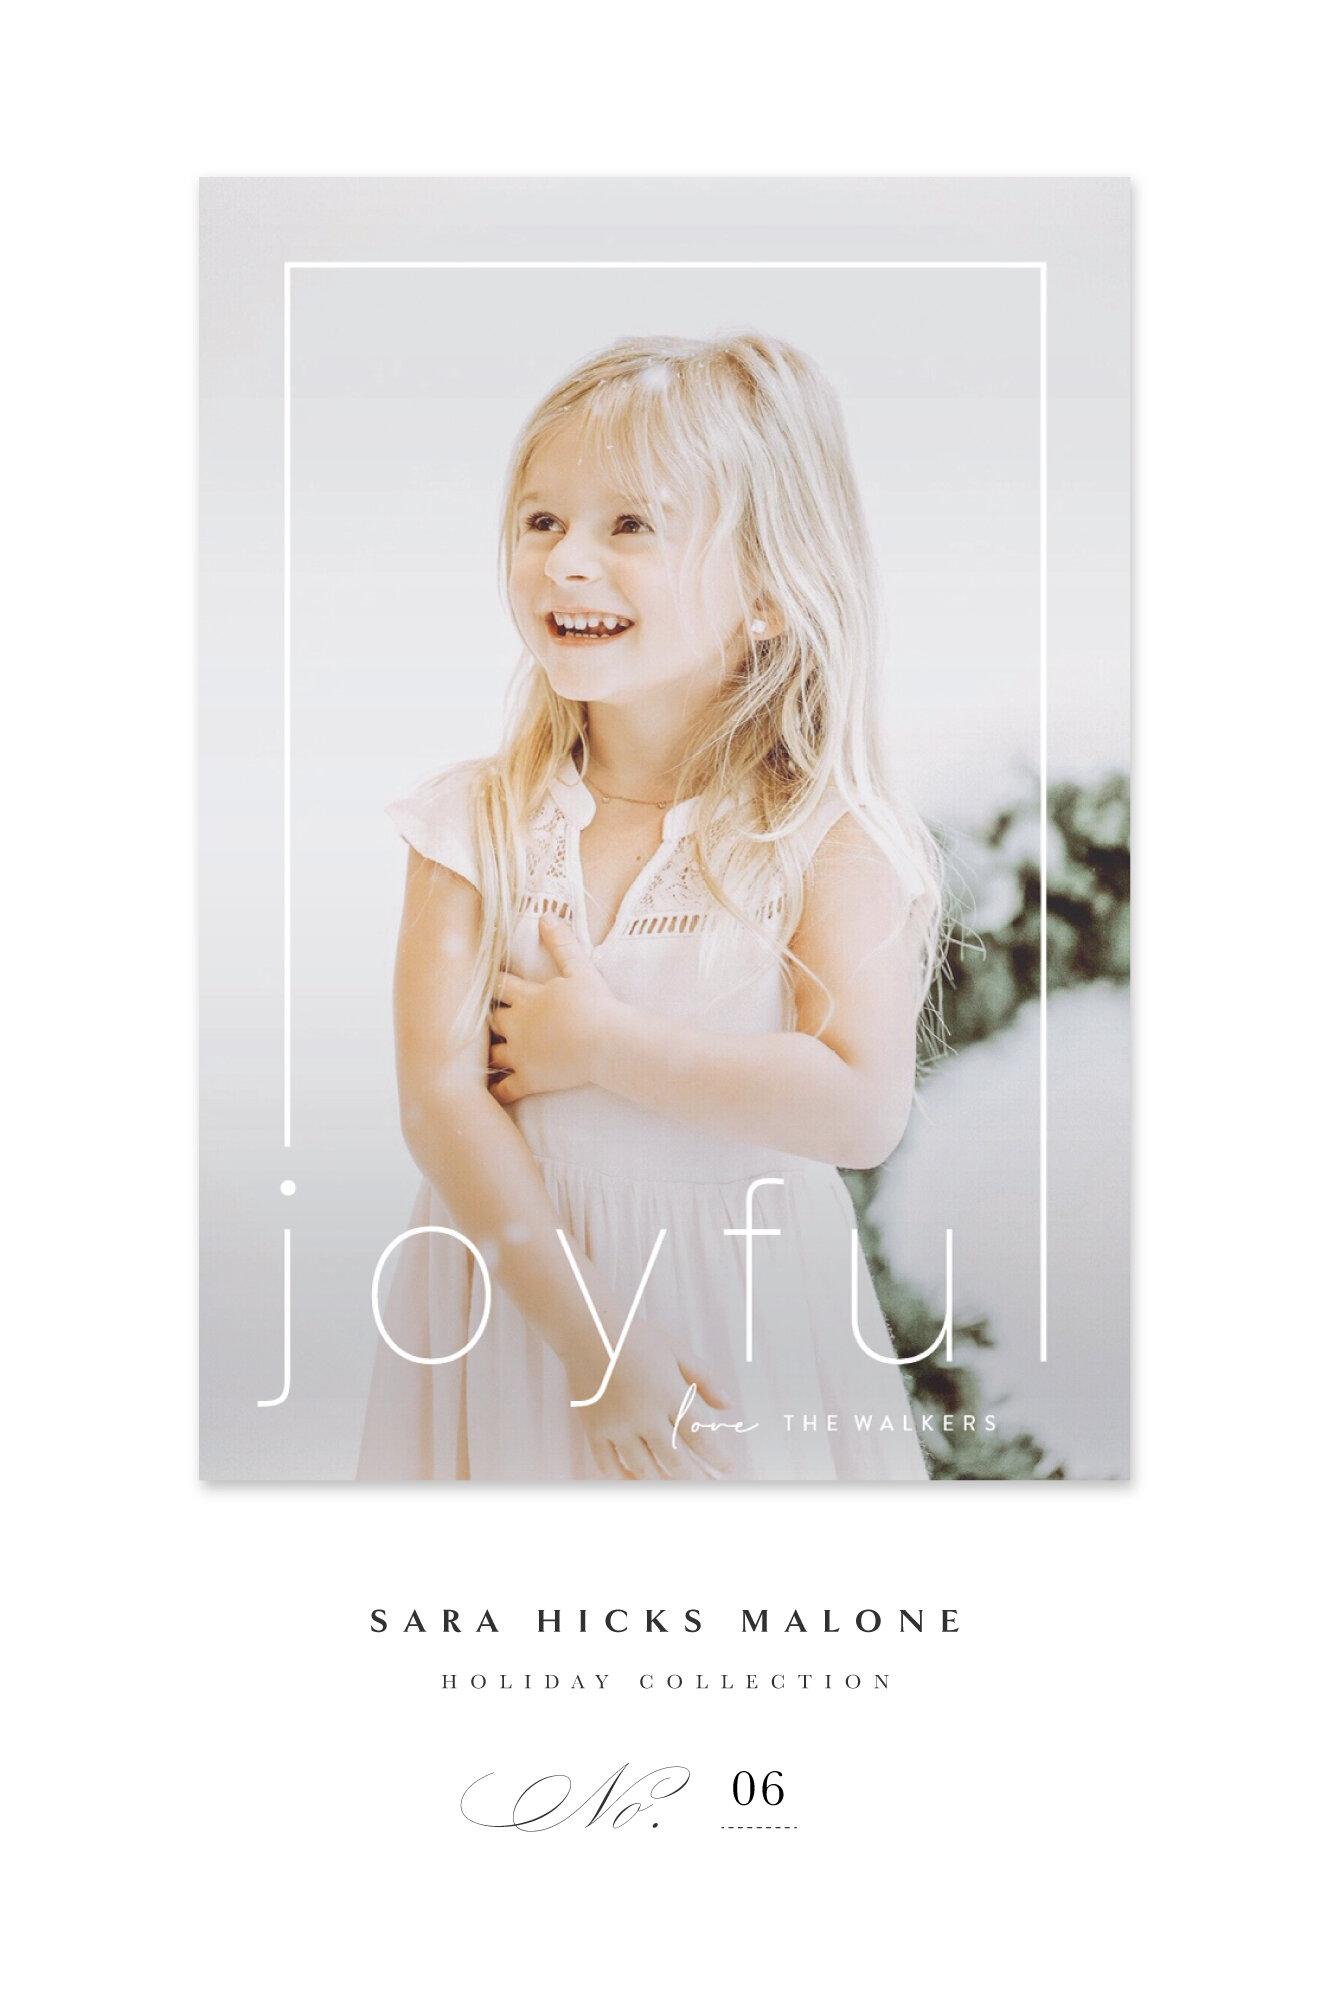 'JOYPOINT' BY SARA HICKS MALONE